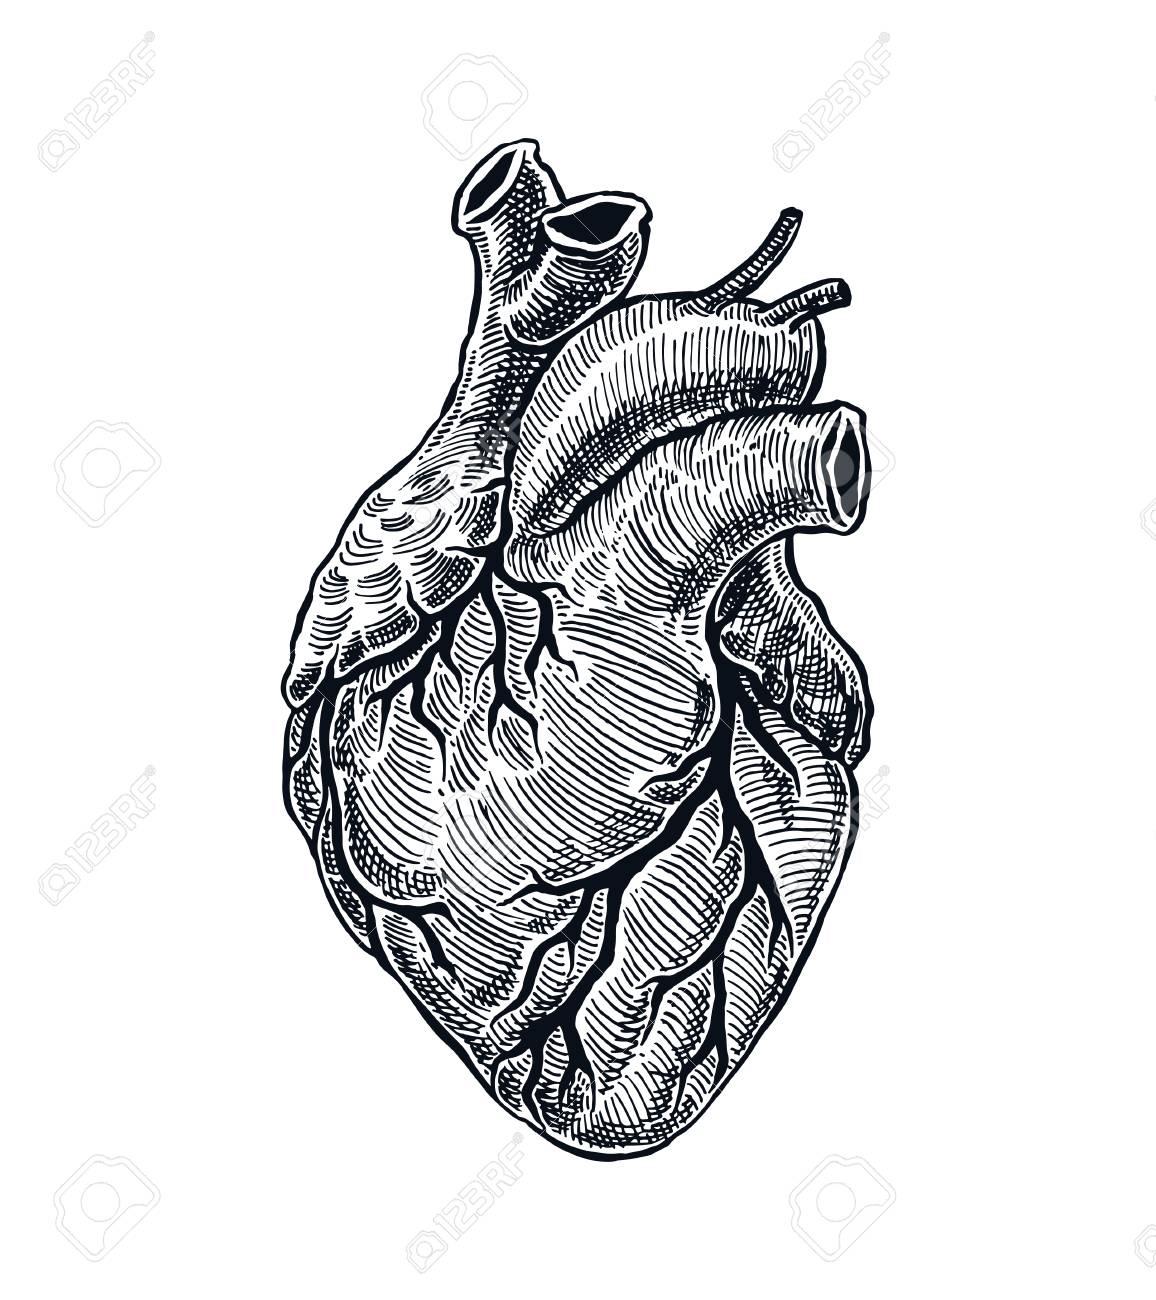 Realistic Human Heart. Vintage style. Hand Drawn illustration - 91026665